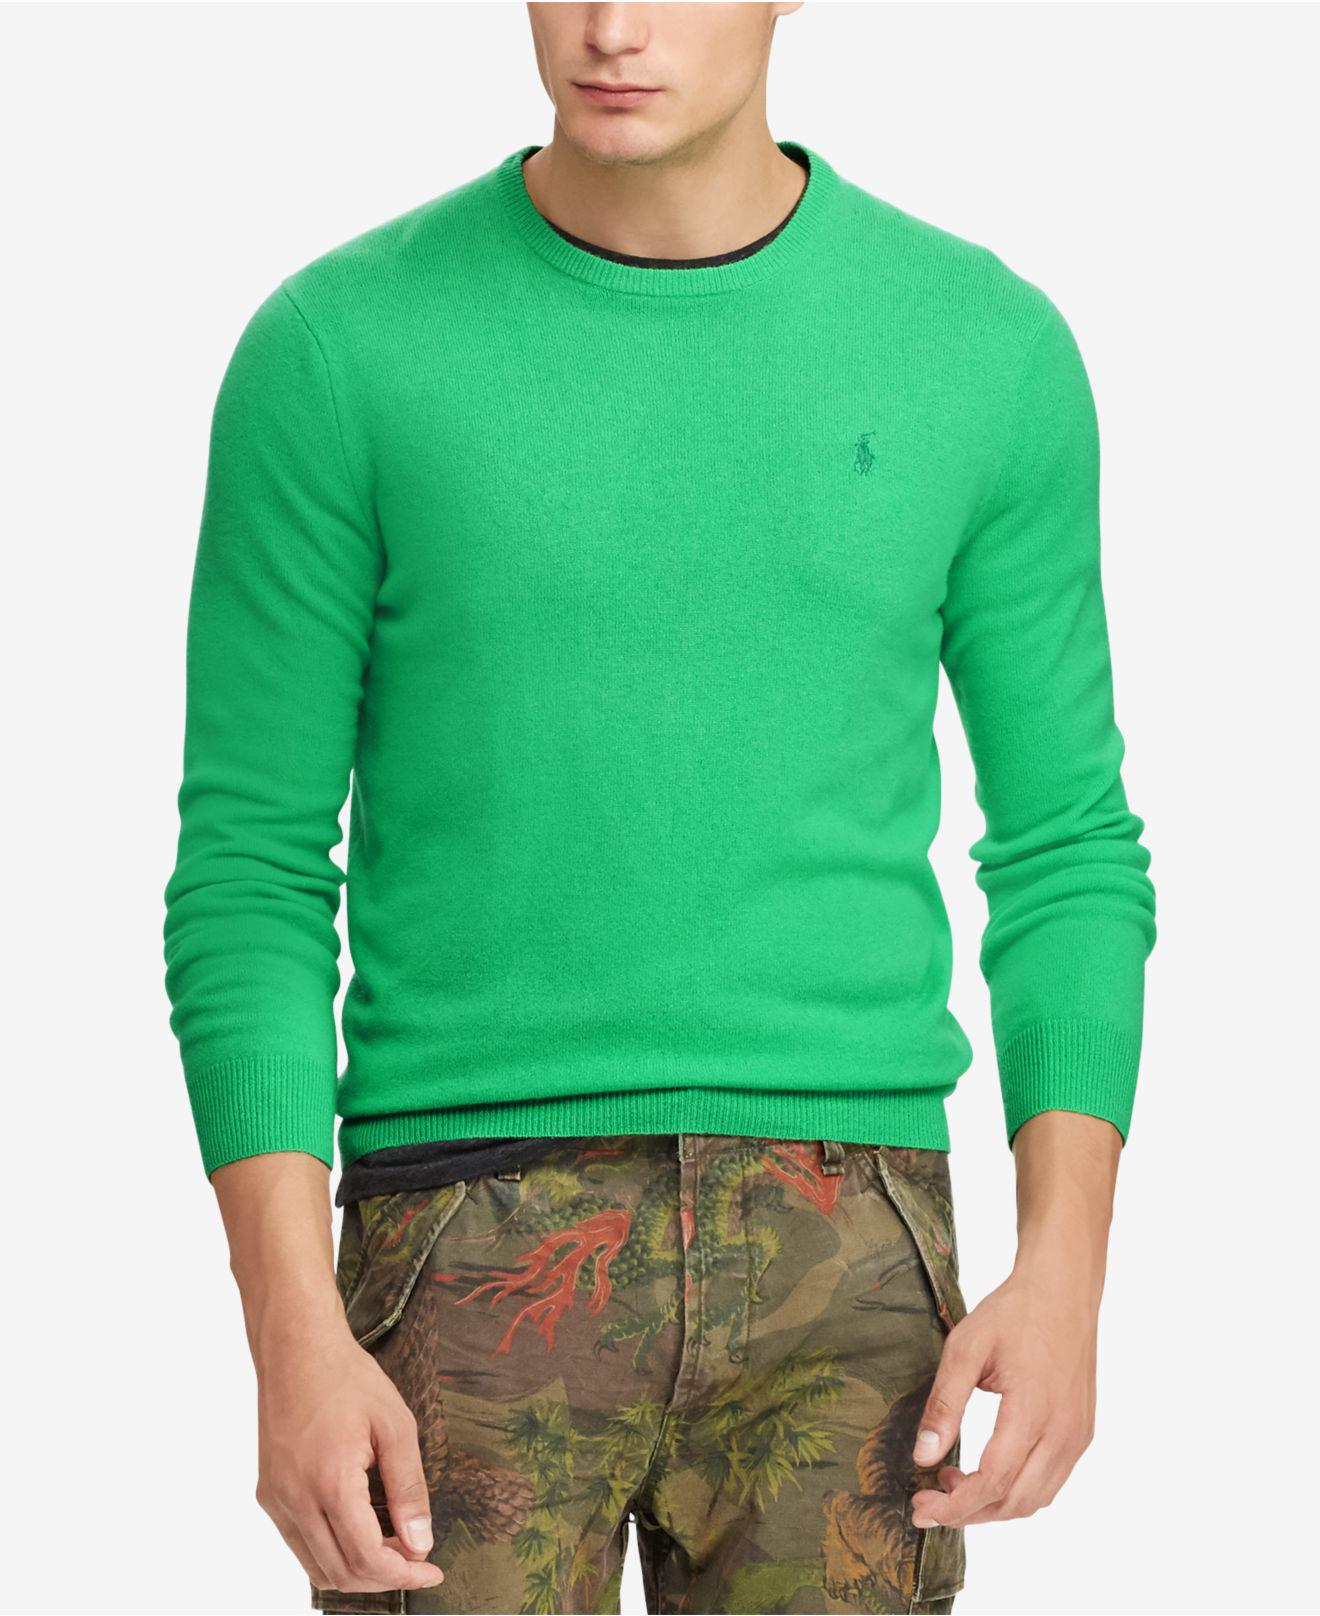 66fcdf0963e15 Lyst - Polo Ralph Lauren Cashmere Crew Neck Sweater in Green for Men